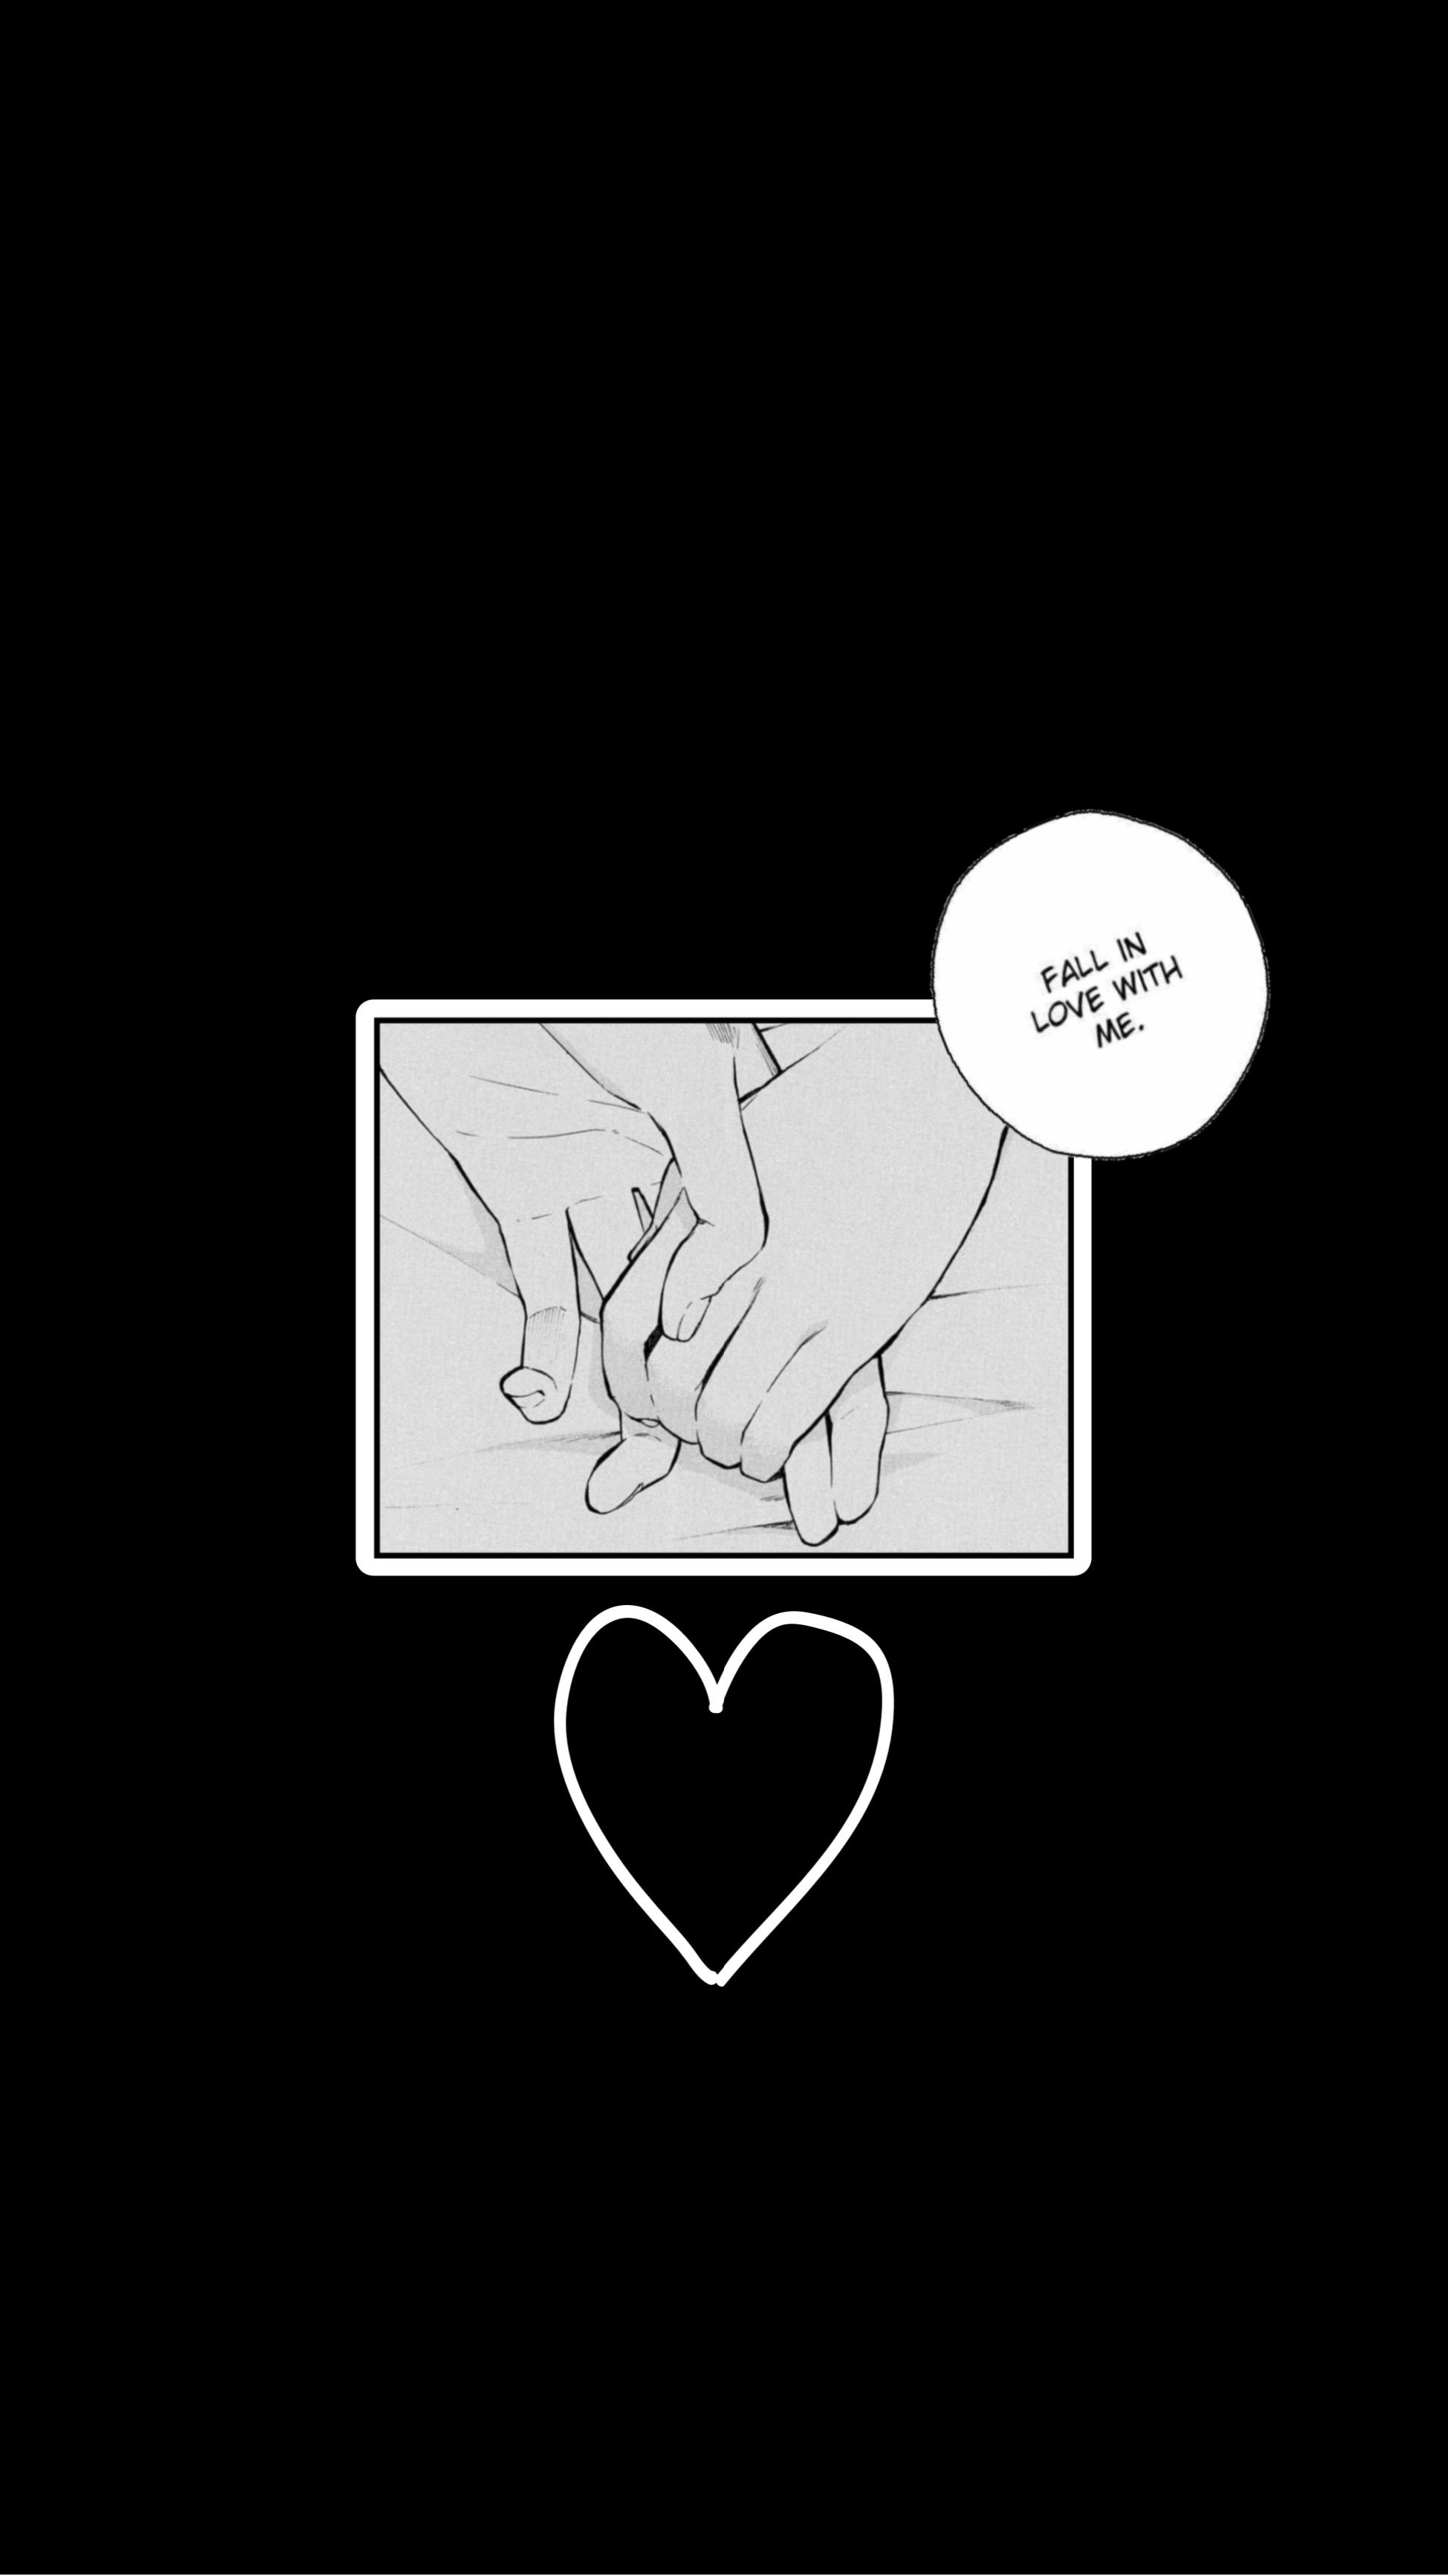 Manga Love Cute Love Wallpapers Manga Love Love Wallpapers Romantic Anime wallpaper black white love